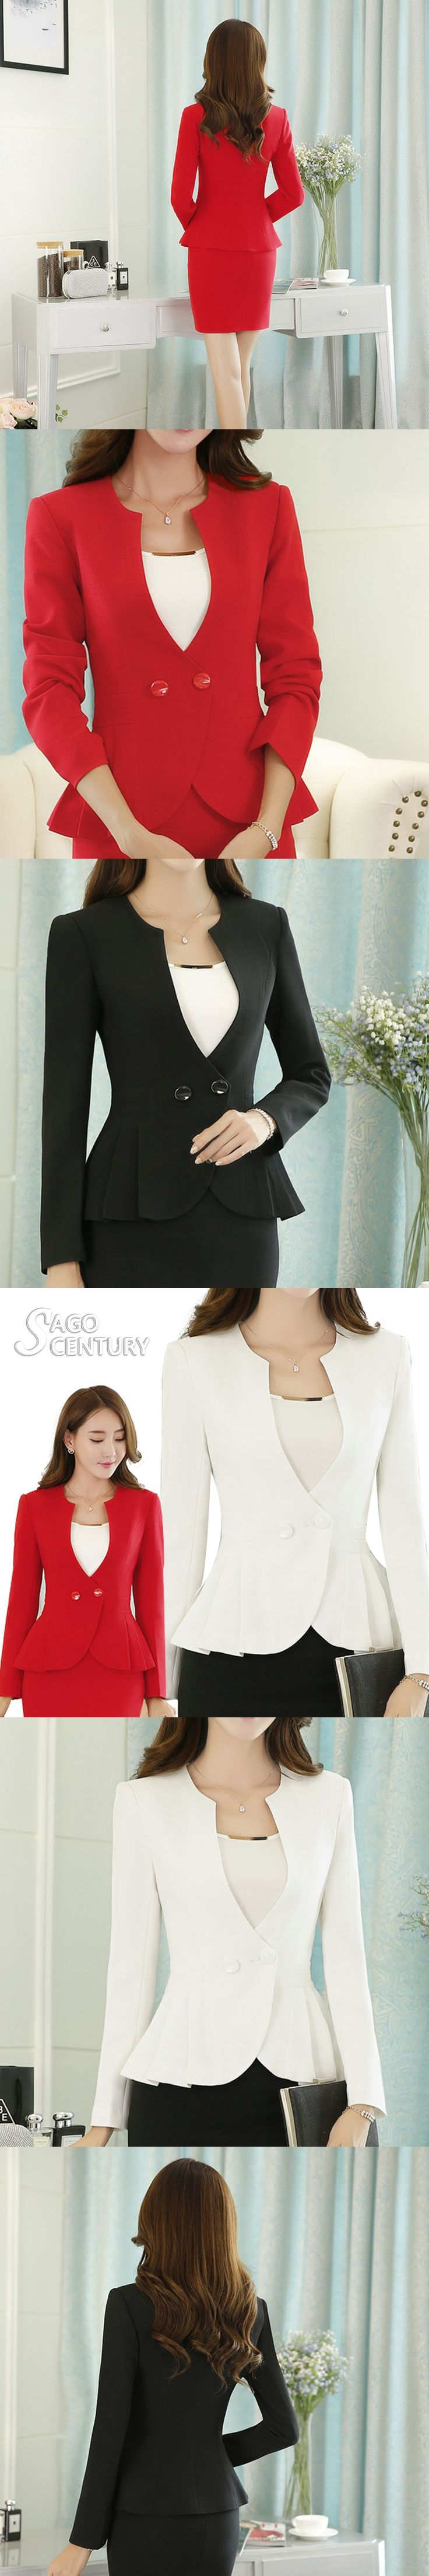 2017 New Spring Slim Long Sleeve feminino Blazer Work Office Lady Business Outwear Casual Coat Plus Size S-4XL Jacket For Women